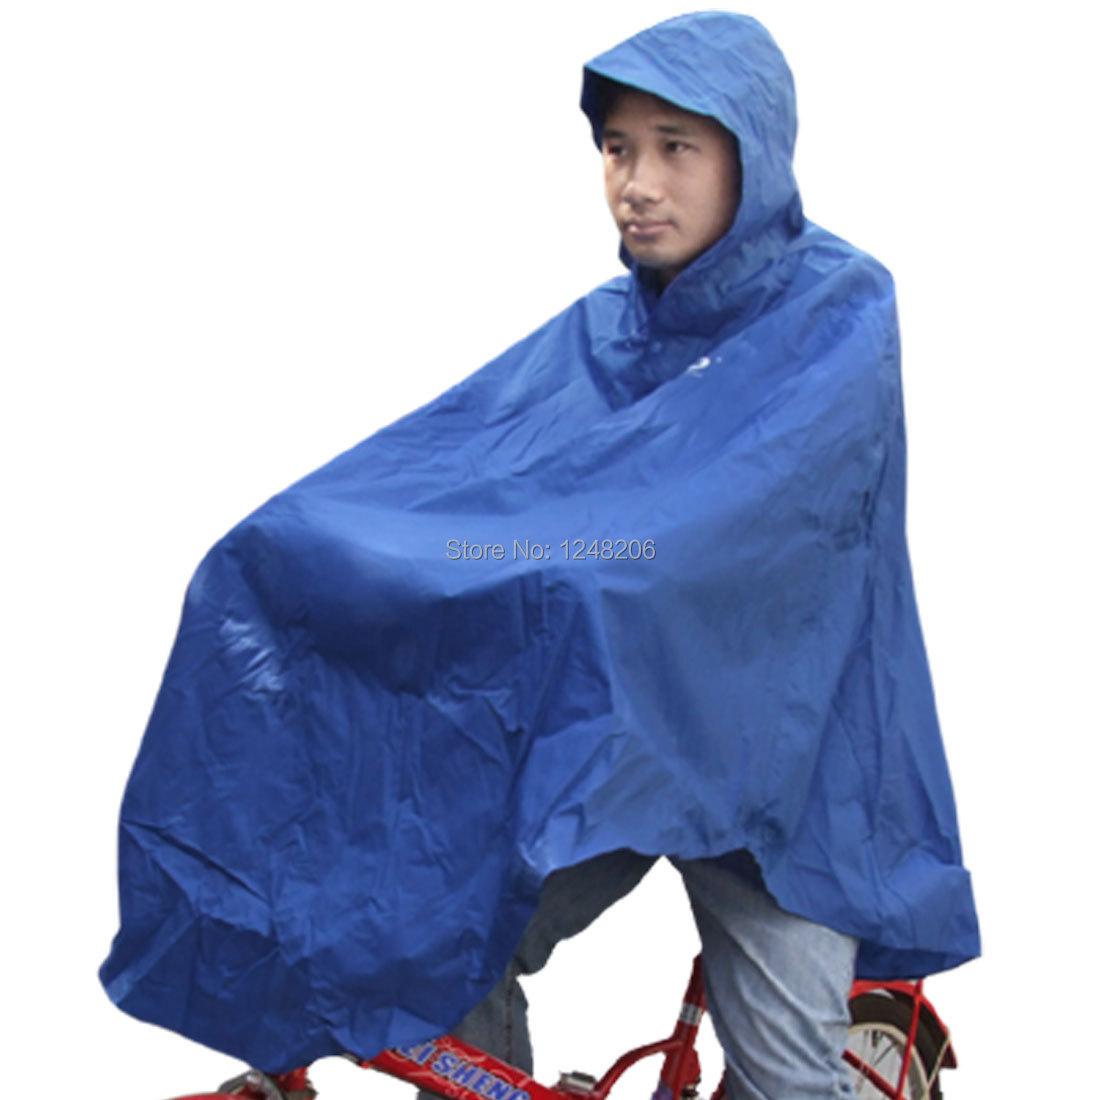 Anti Waving Hooded PVC Raincoat for Bicycle Rider blue(China (Mainland))